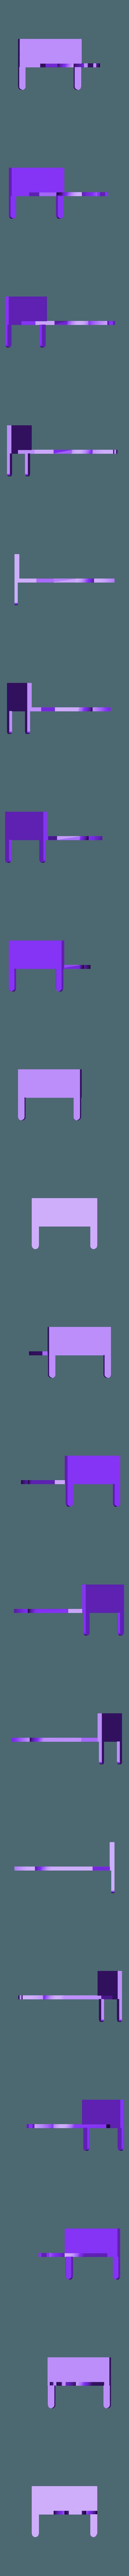 Leg_Left.stl Download free STL file T-Rex Windup Walker • 3D printer model, gzumwalt